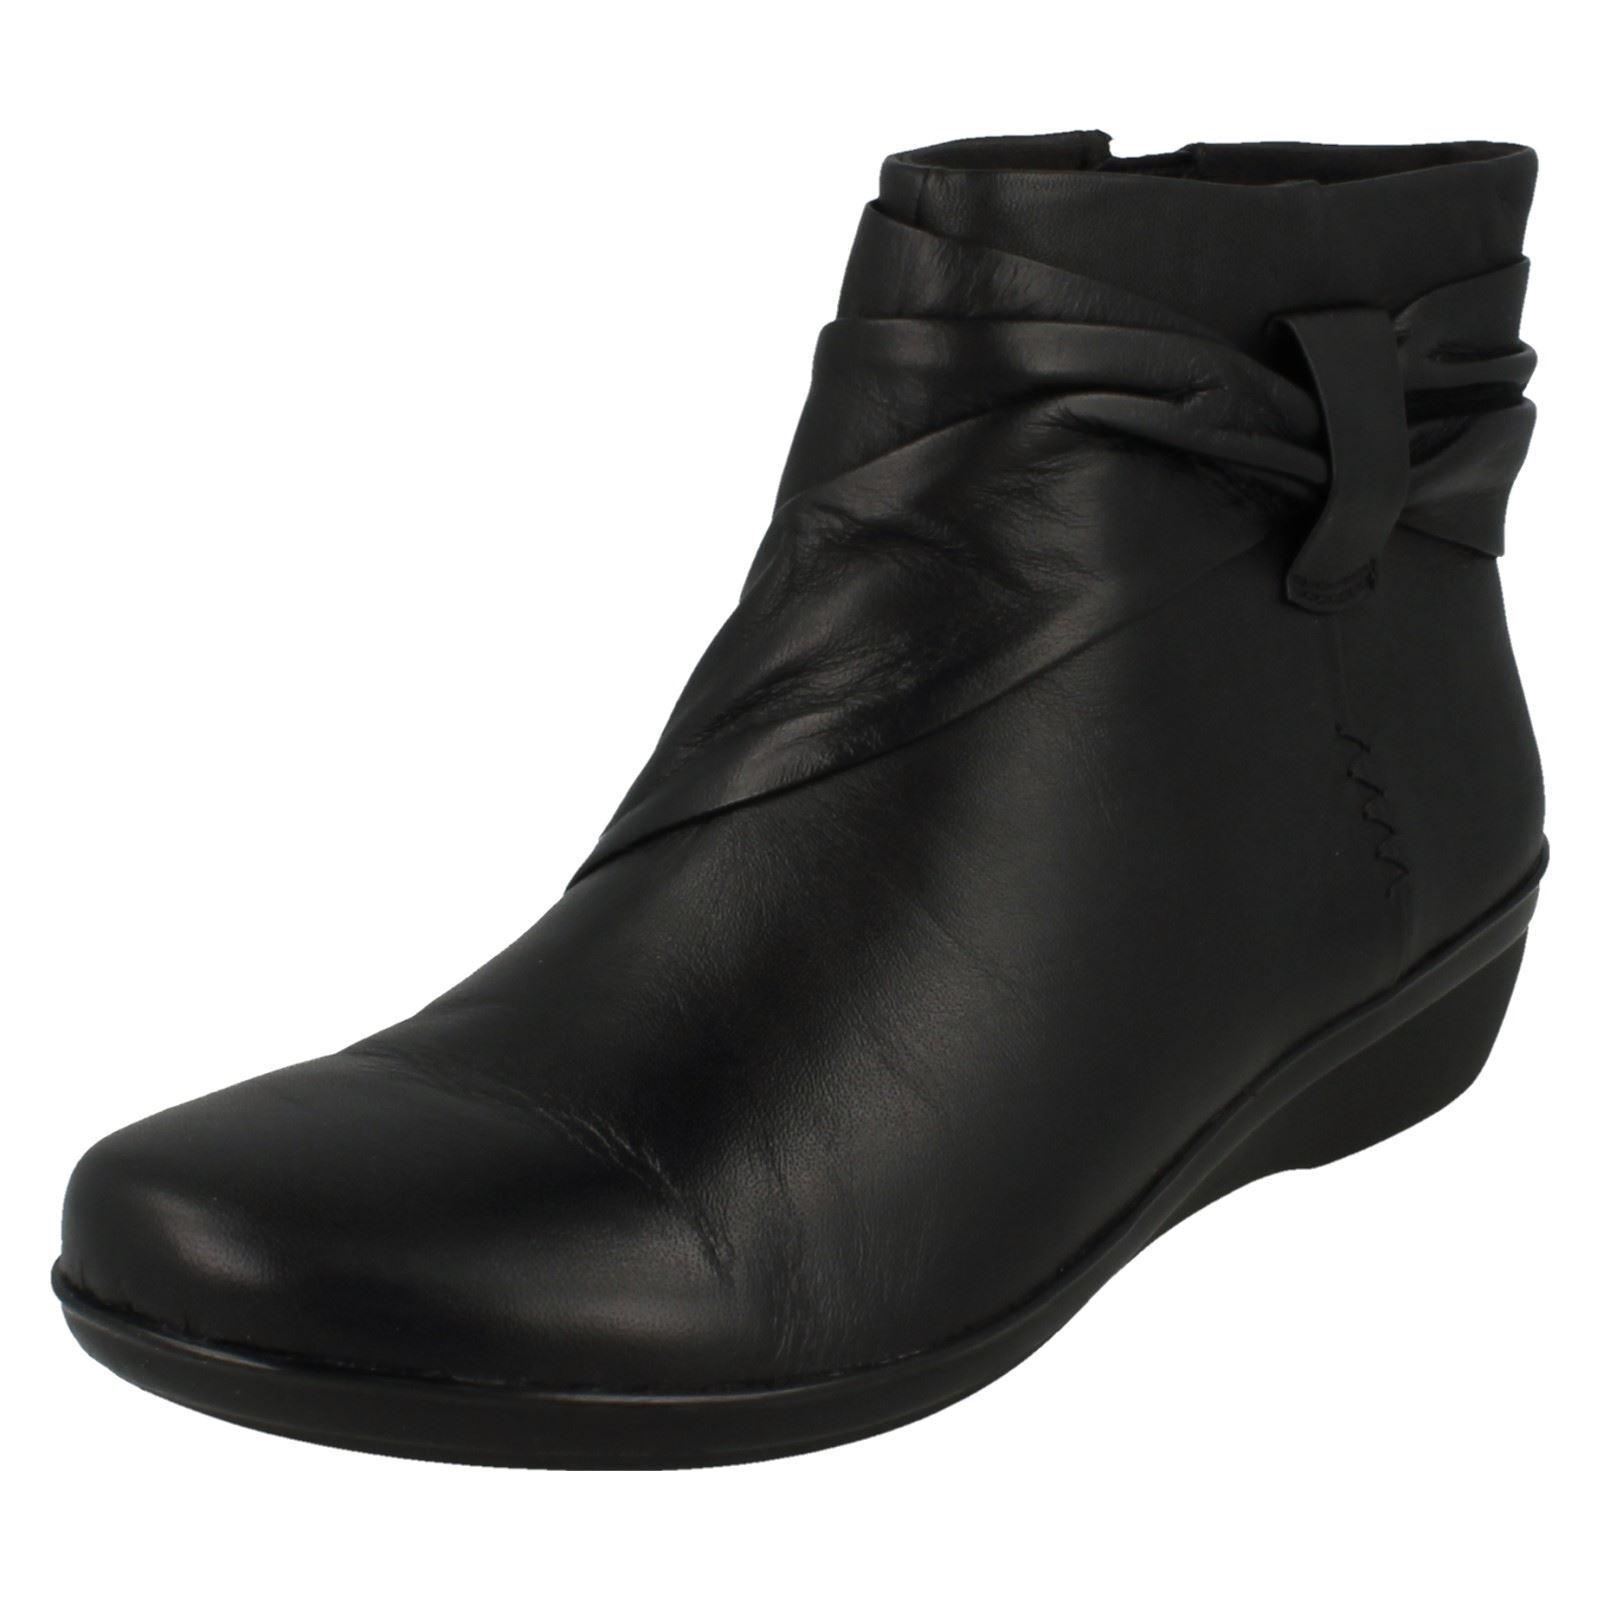 Donna EVERLAY Mandy Clarks Nero Pelle Stivali da Clarks Mandy retail (larghezza D) c188d2